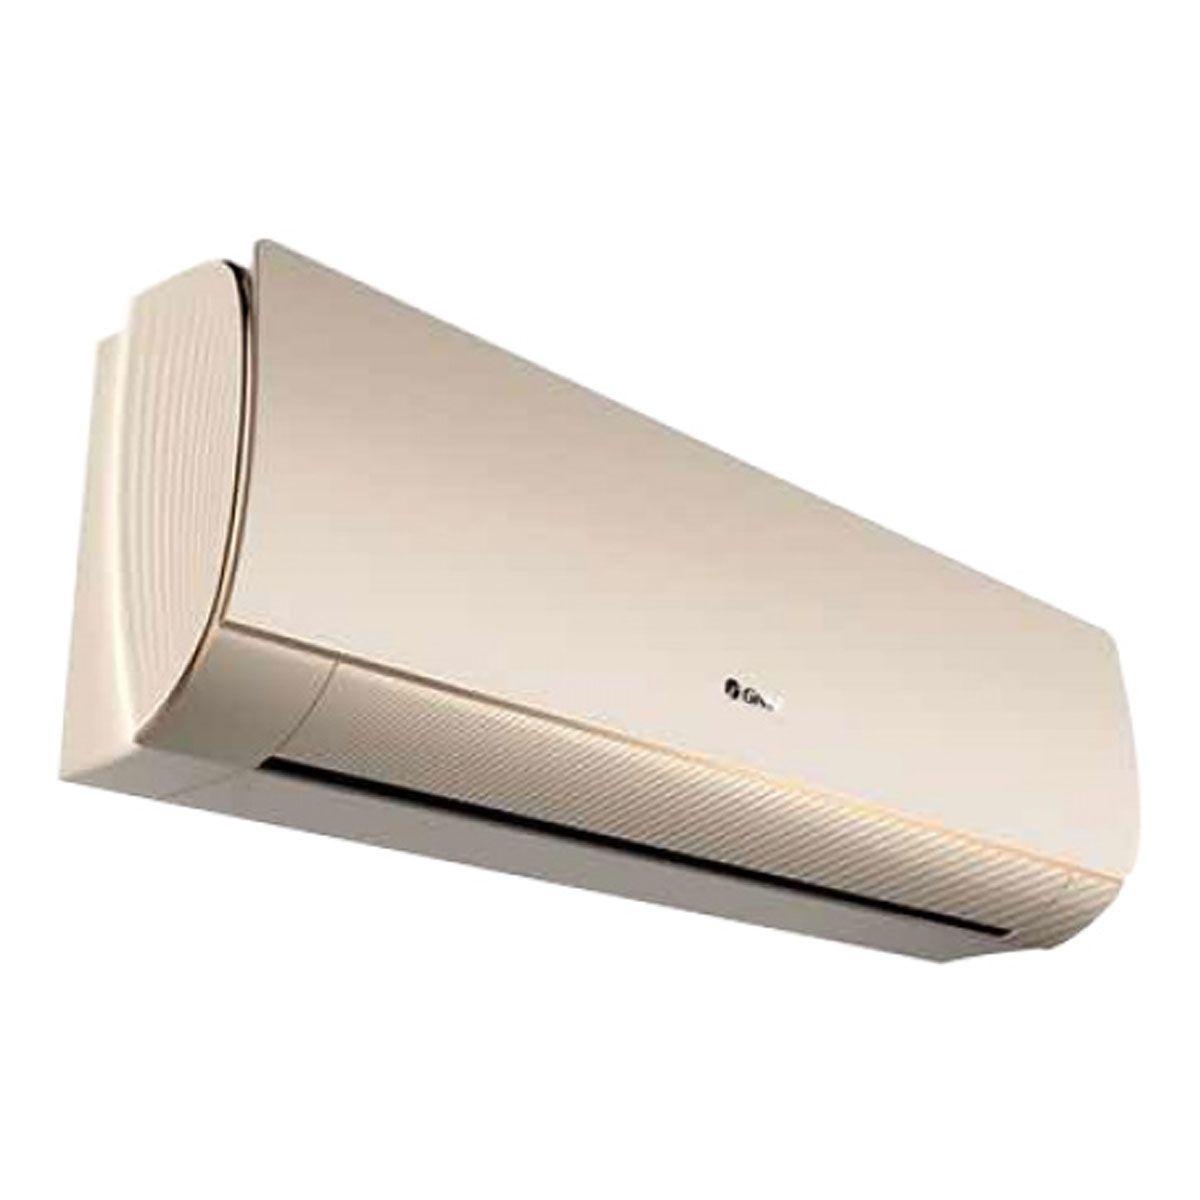 Gree 1.5 Ton Fairy Series Inverter Split AC (GS18FITH1C)